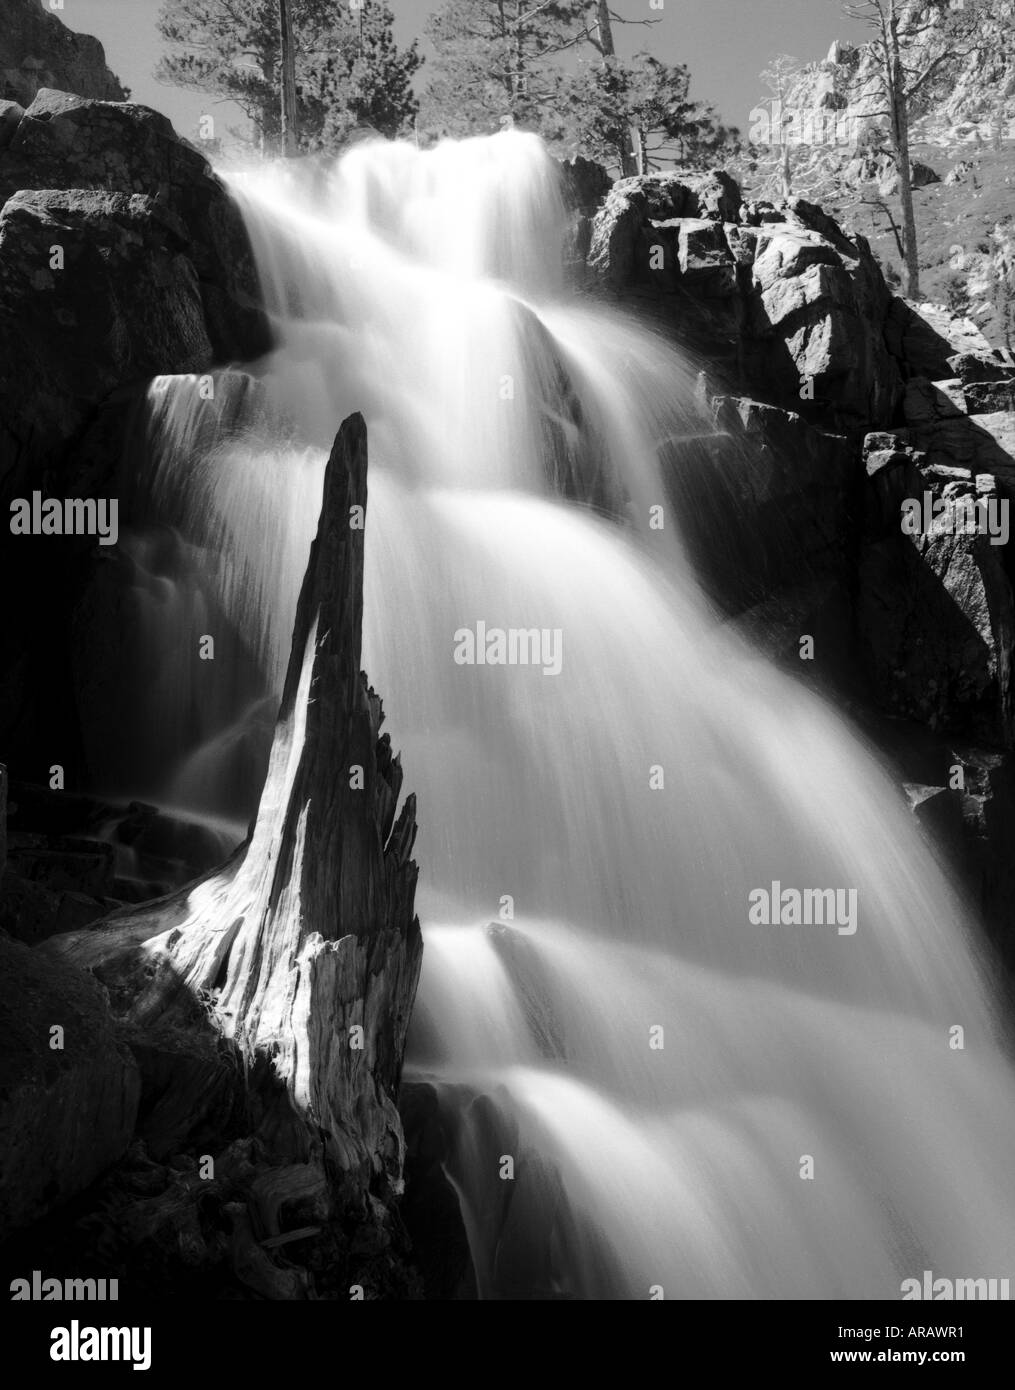 Lower Eagle Falls South Lake Tahoe Eldorado County California USA - Stock Image